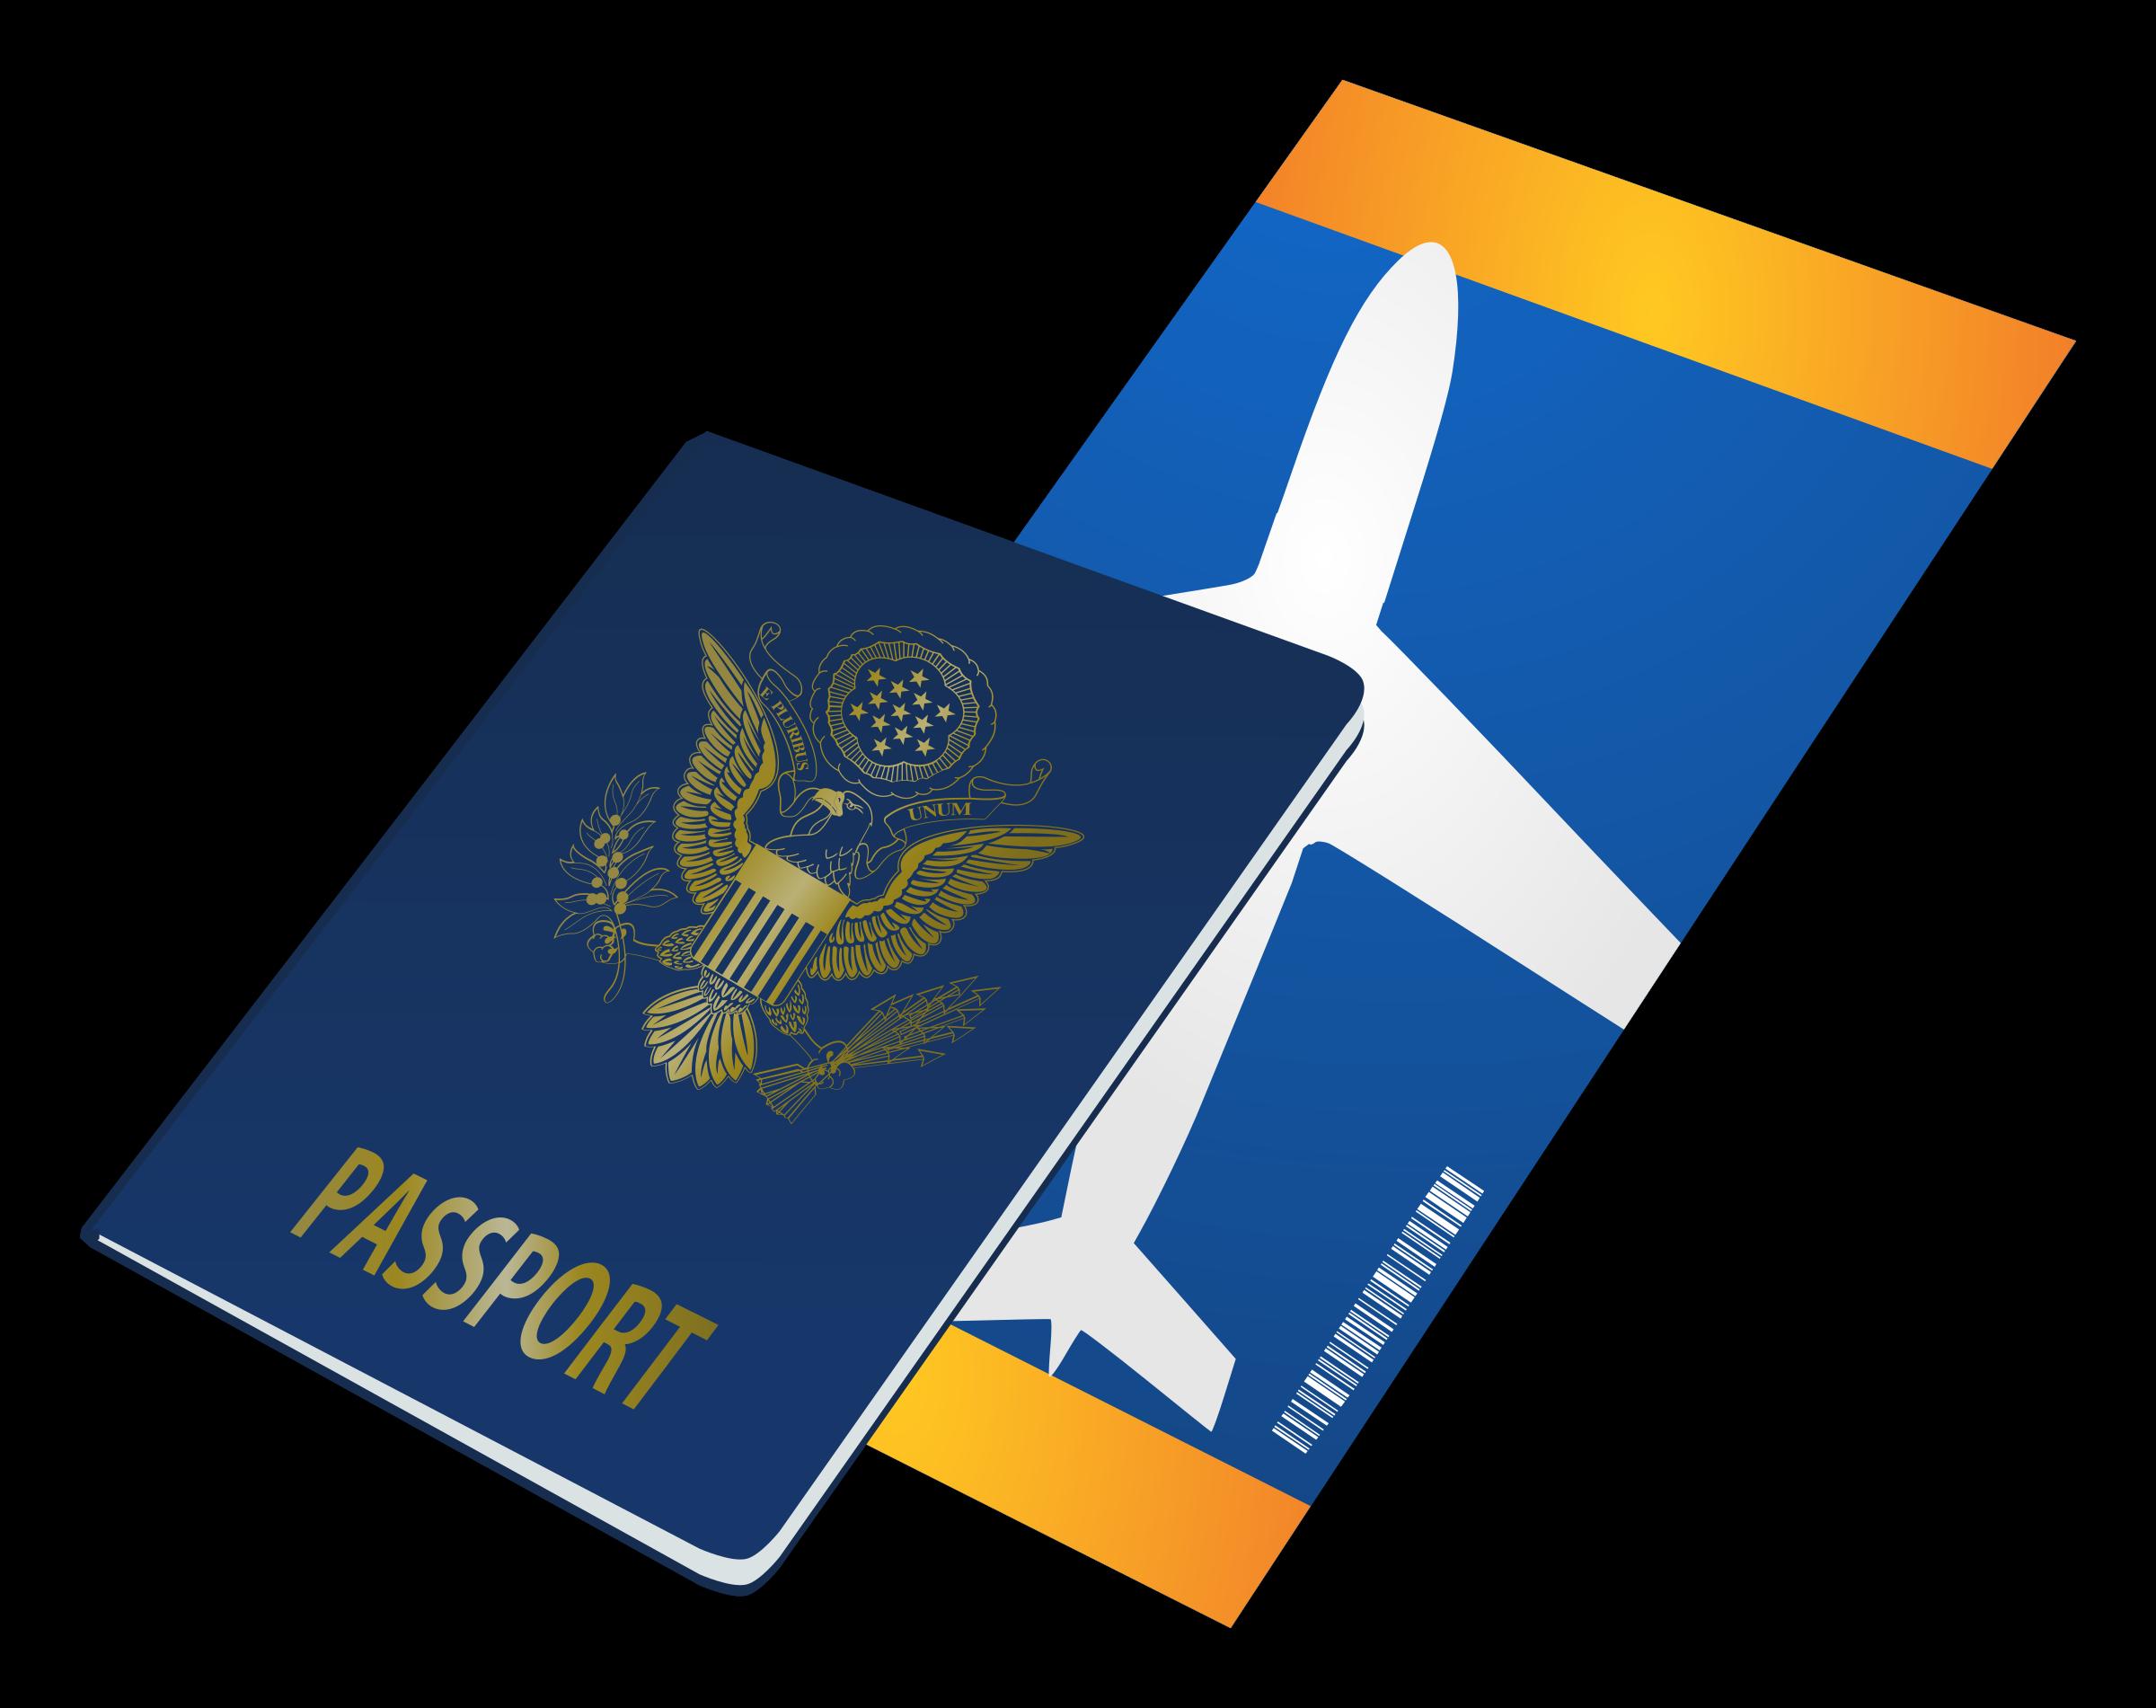 Passport HD PNG - 92007